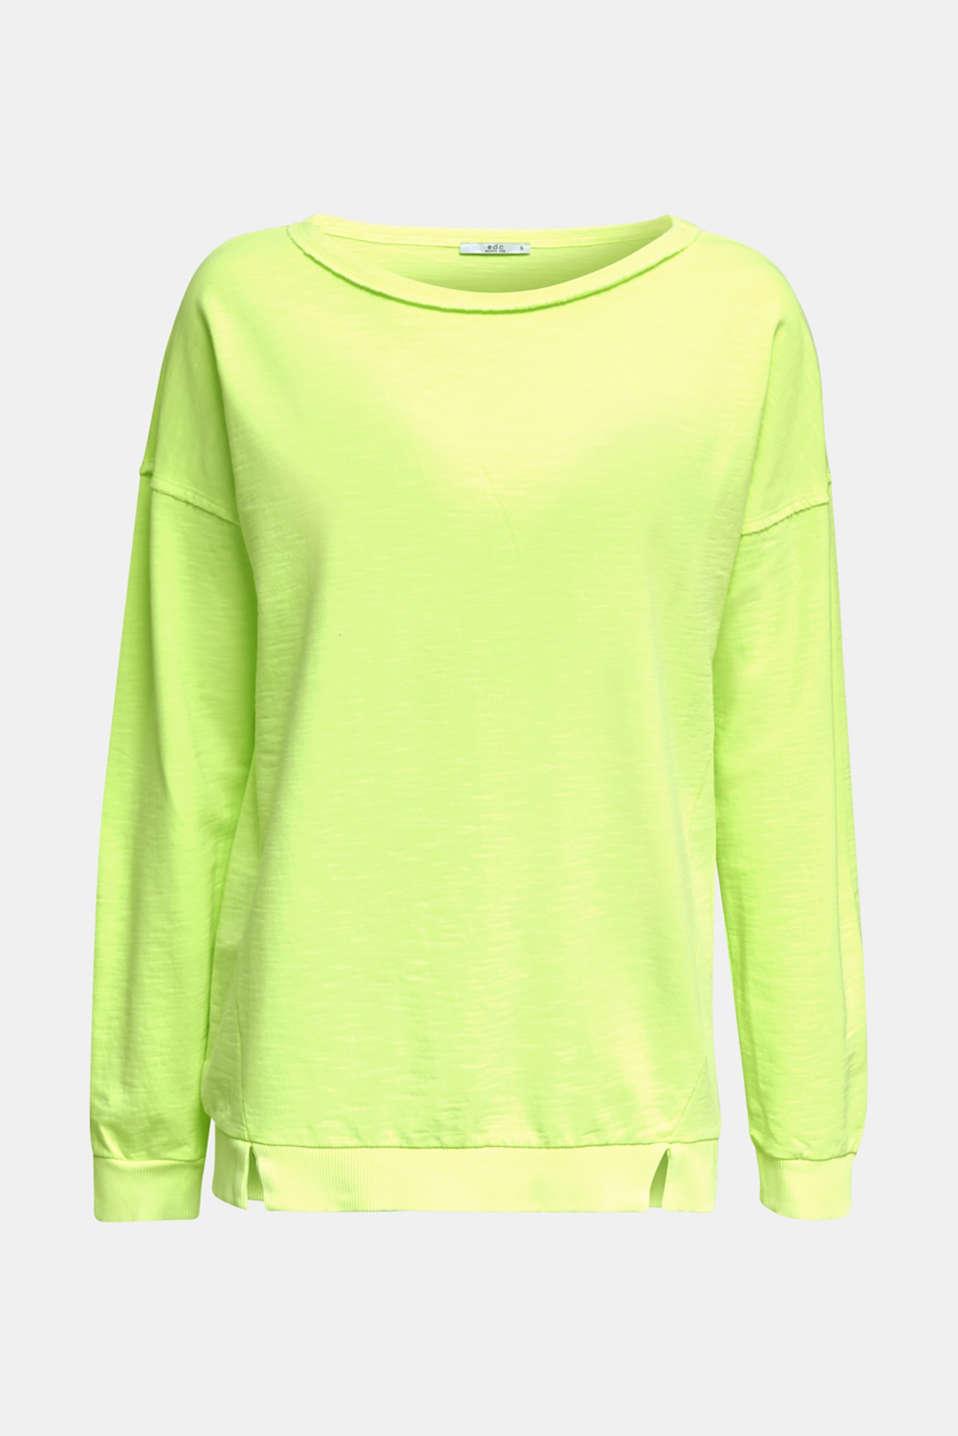 Vintage sweatshirt, LIME YELLOW, detail image number 5